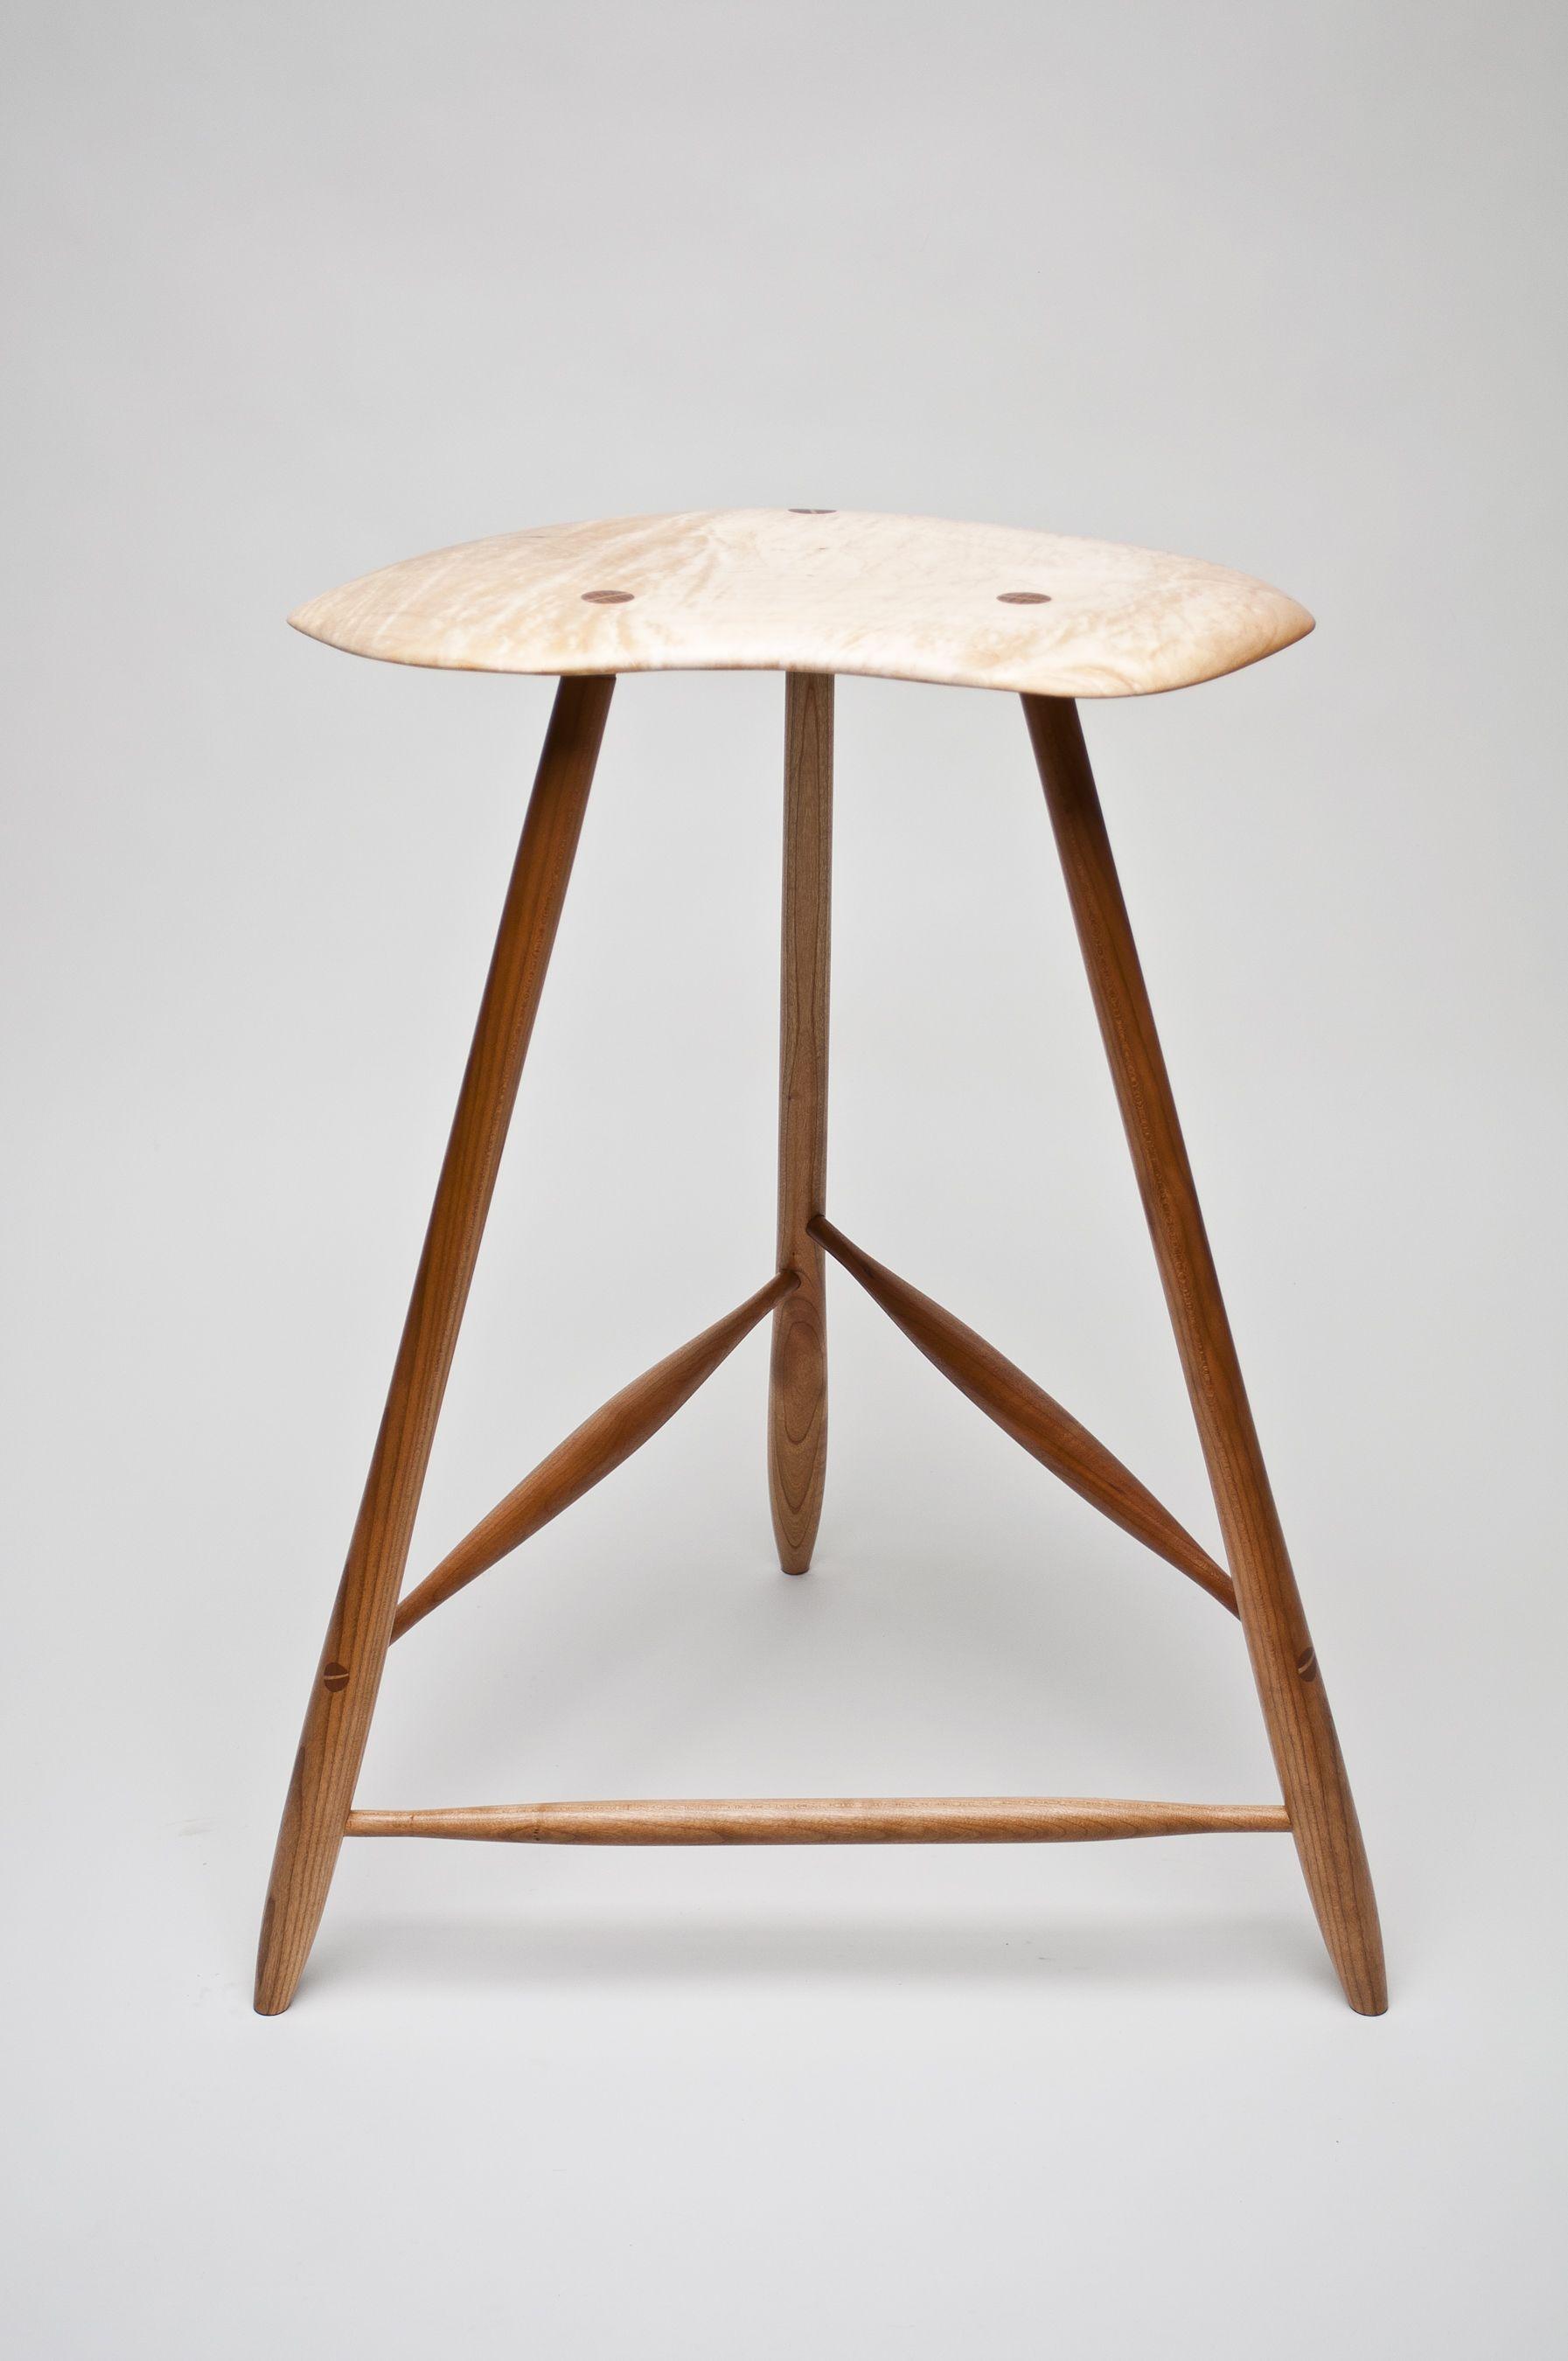 Even More Stools  Art furniture design, Art furniture, Stool